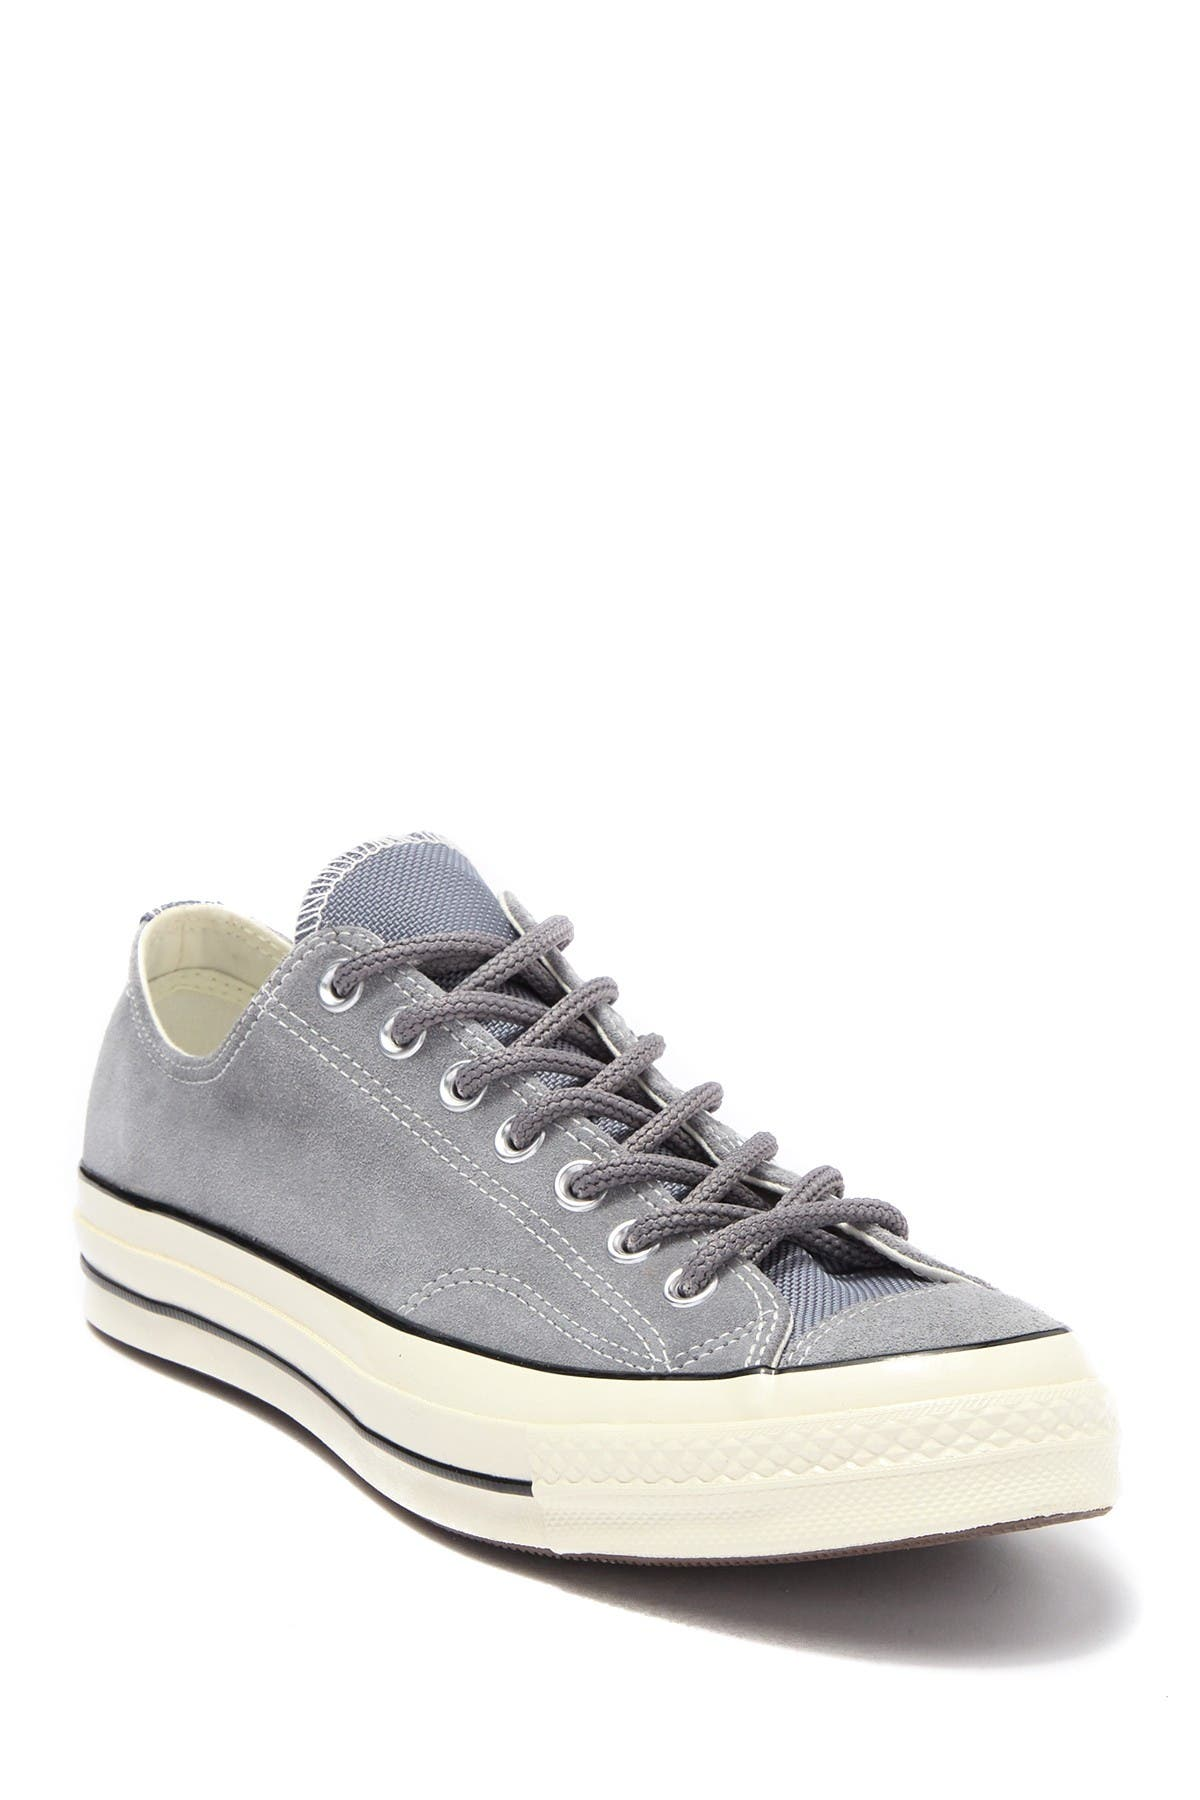 Chuck Taylor All Star 70 Oxford Sneaker